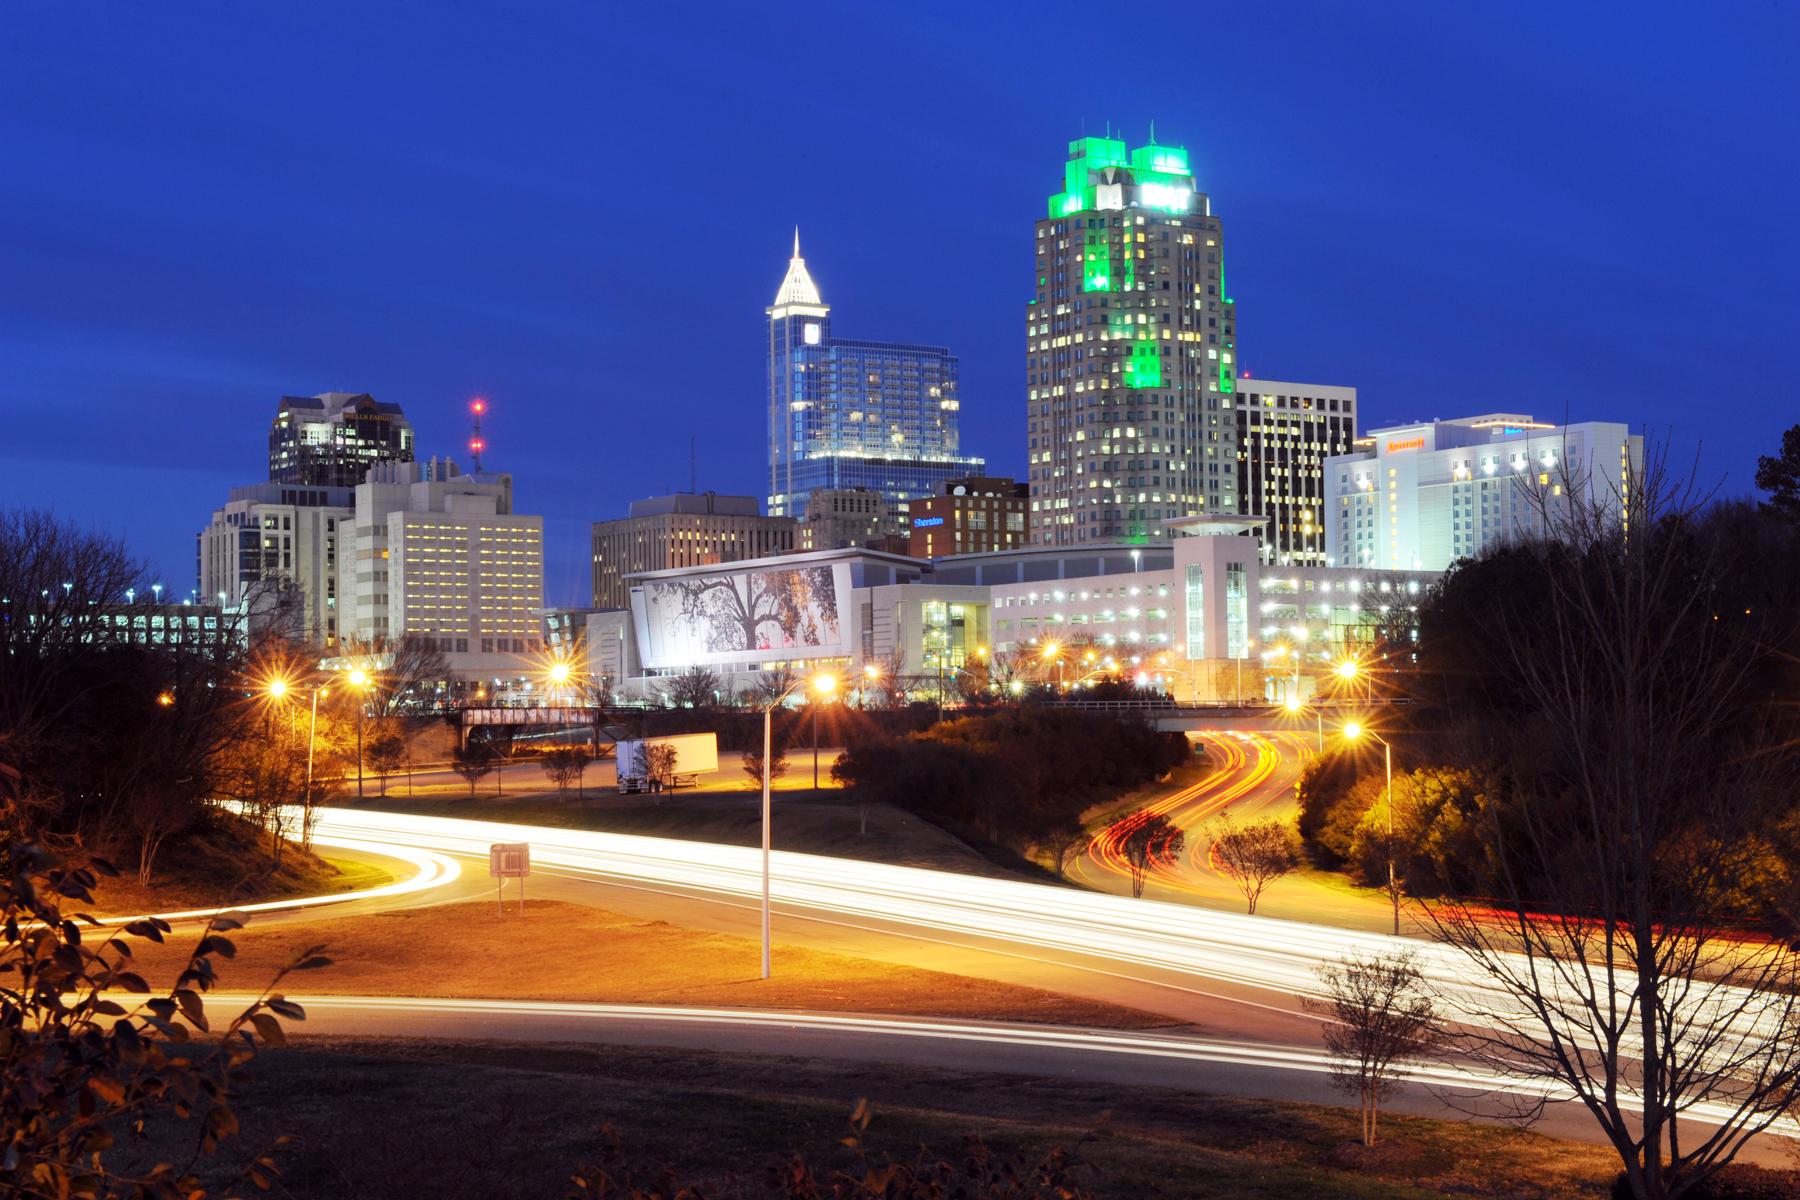 Night in Downtown Raleigh, North Carolina